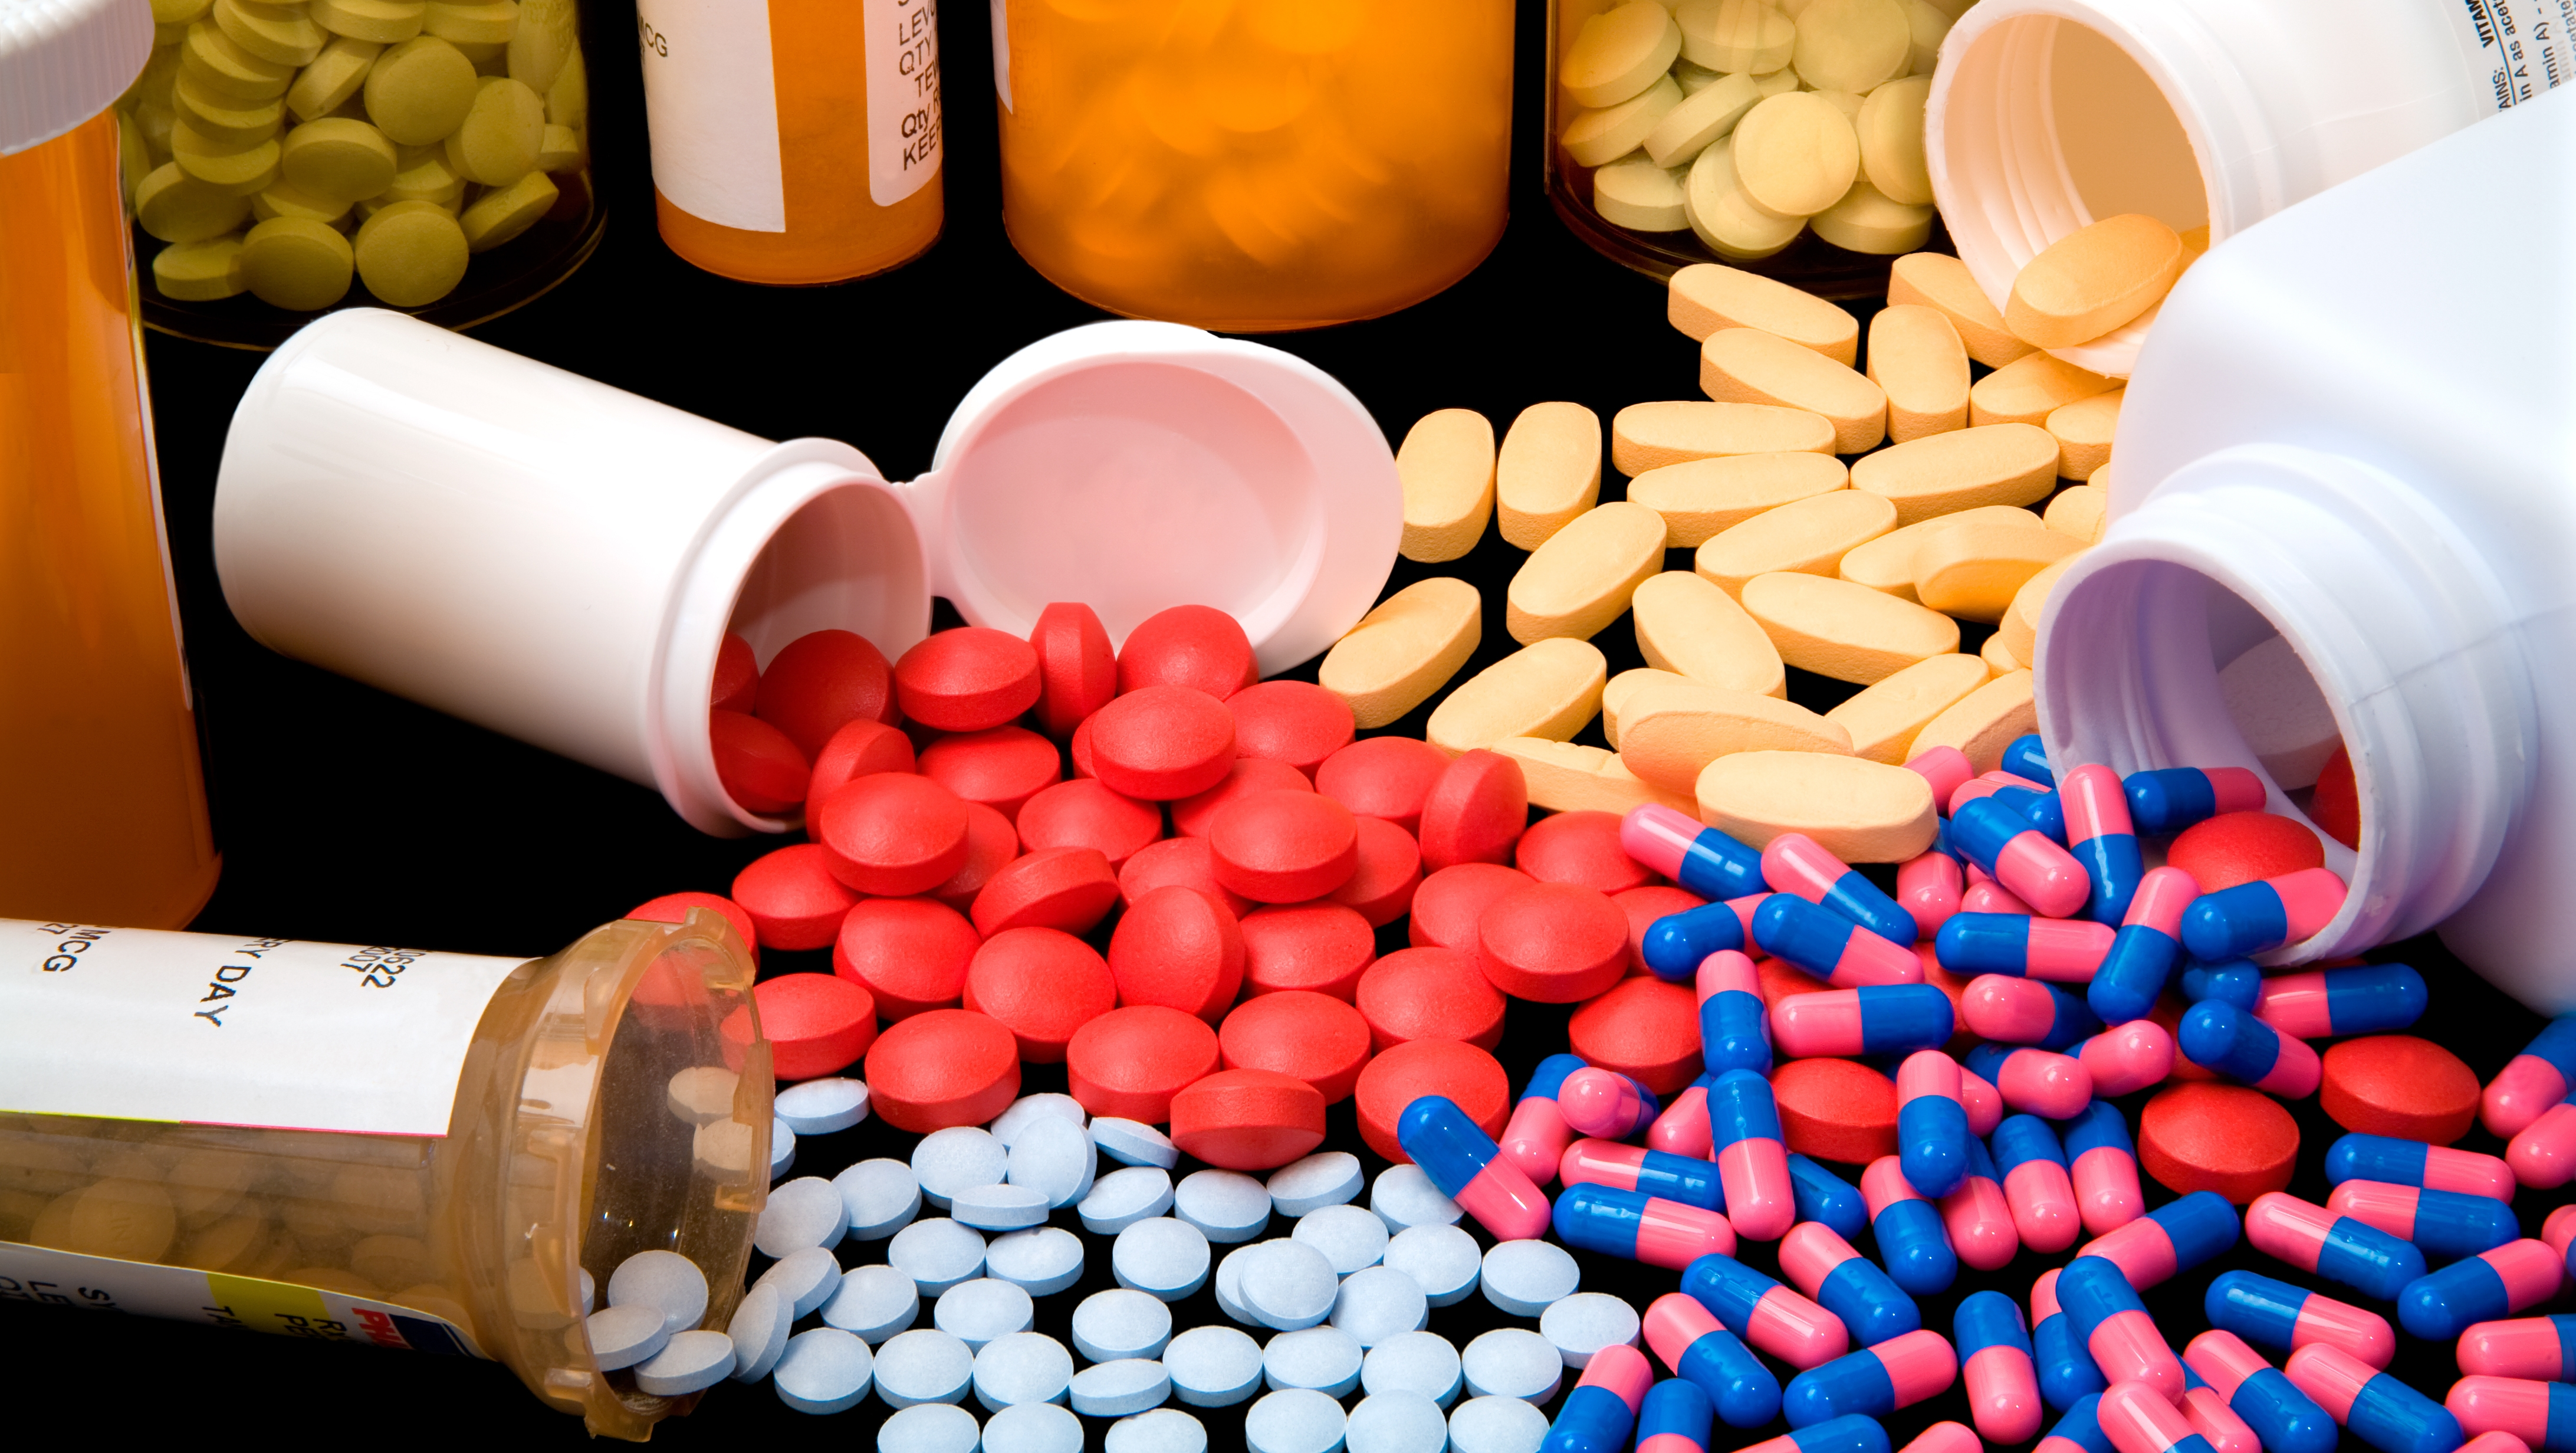 Лечение хронического простатита антибиотиками